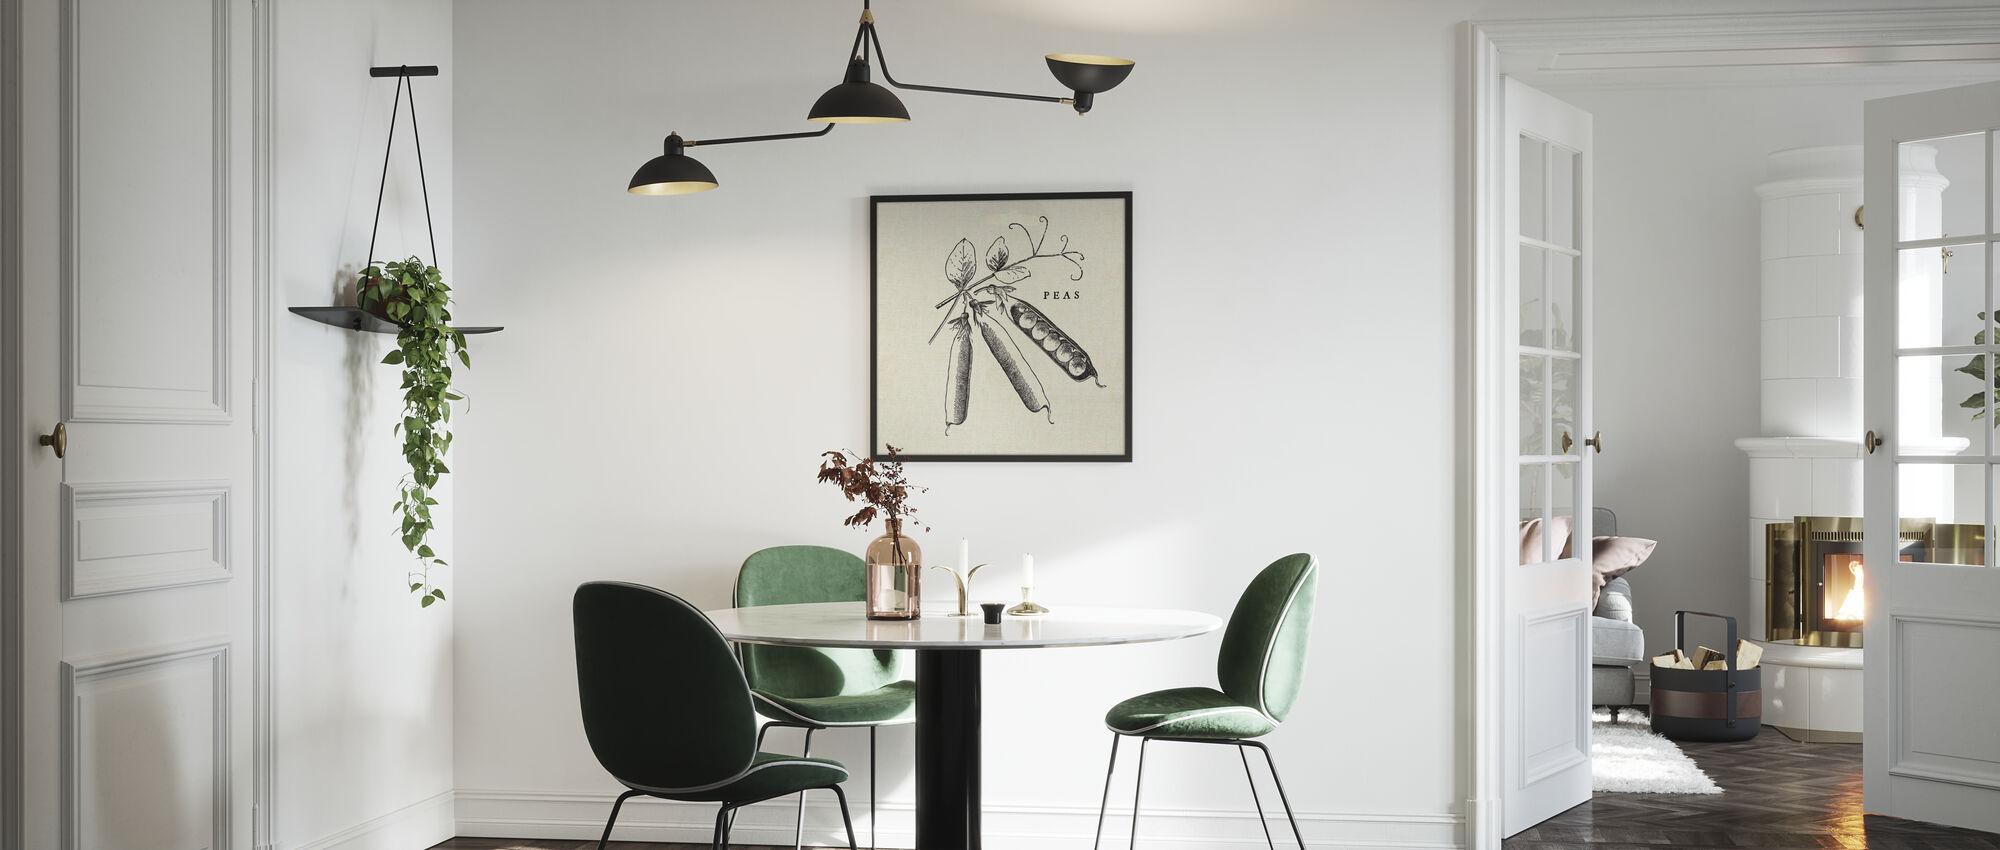 Kitchen Illustration - Peas - Framed print - Kitchen